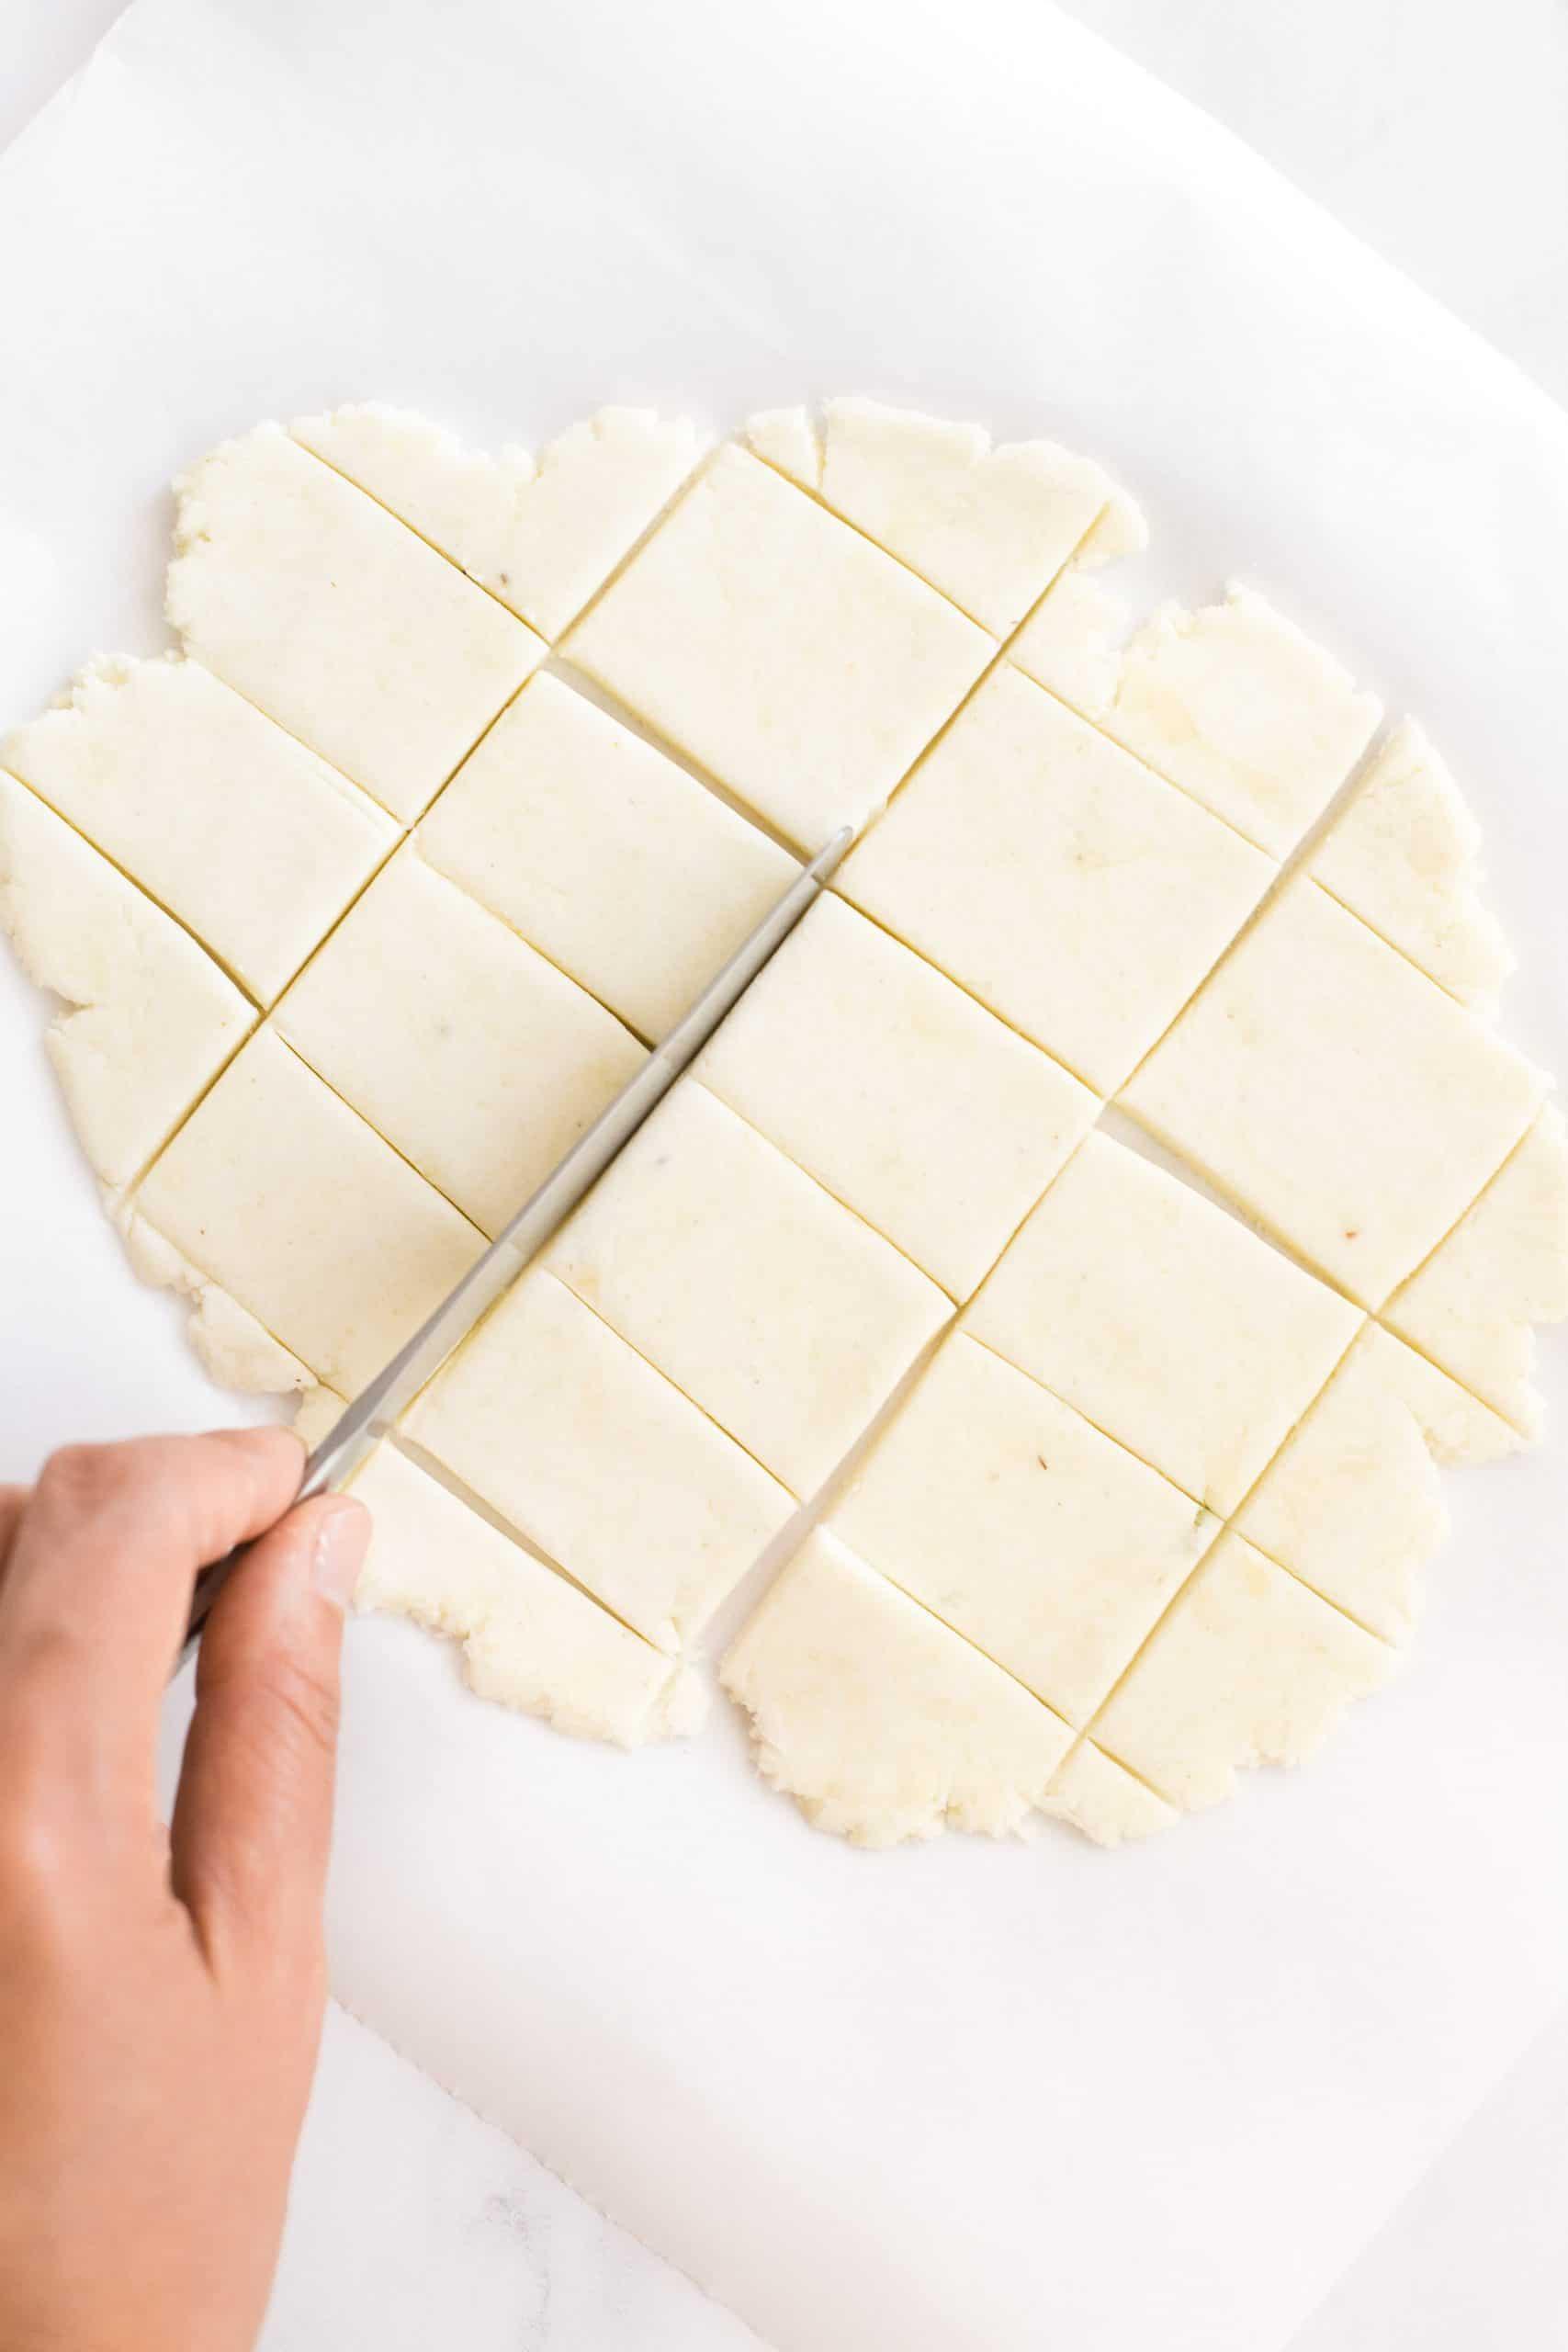 Cutting dough into squares.